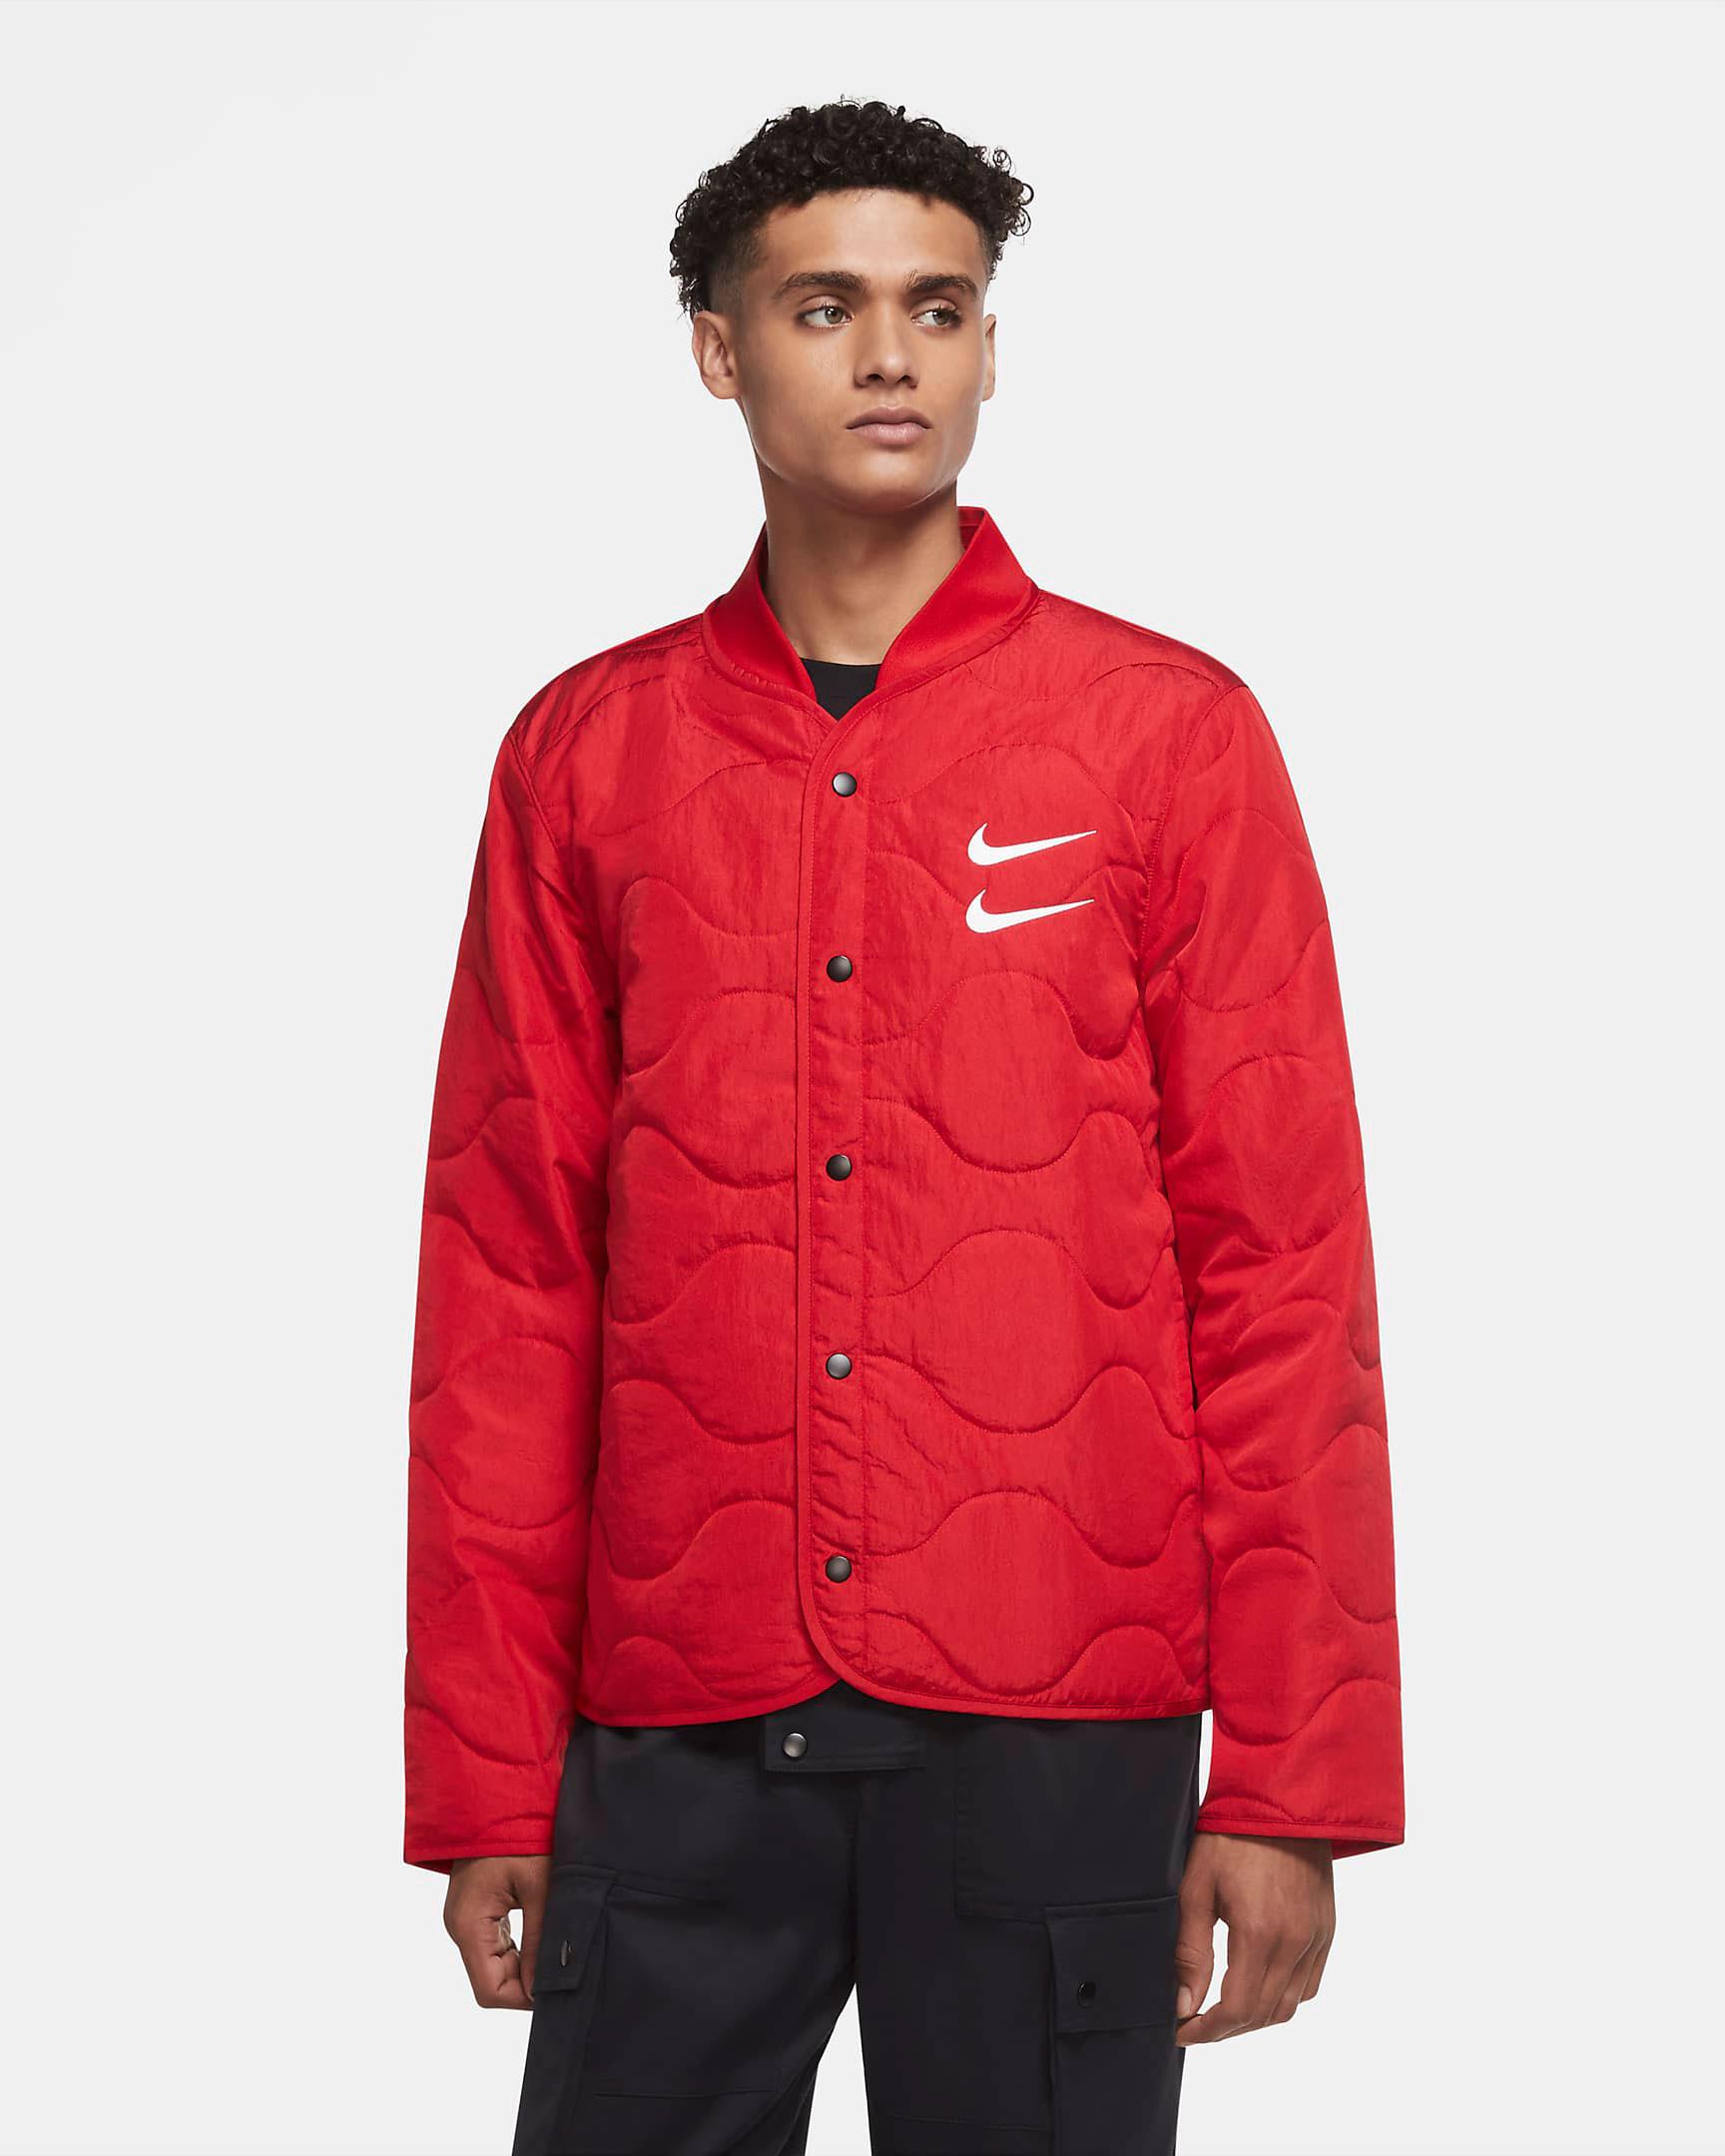 air-jordan-4-fire-red-nike-air-jacket-1